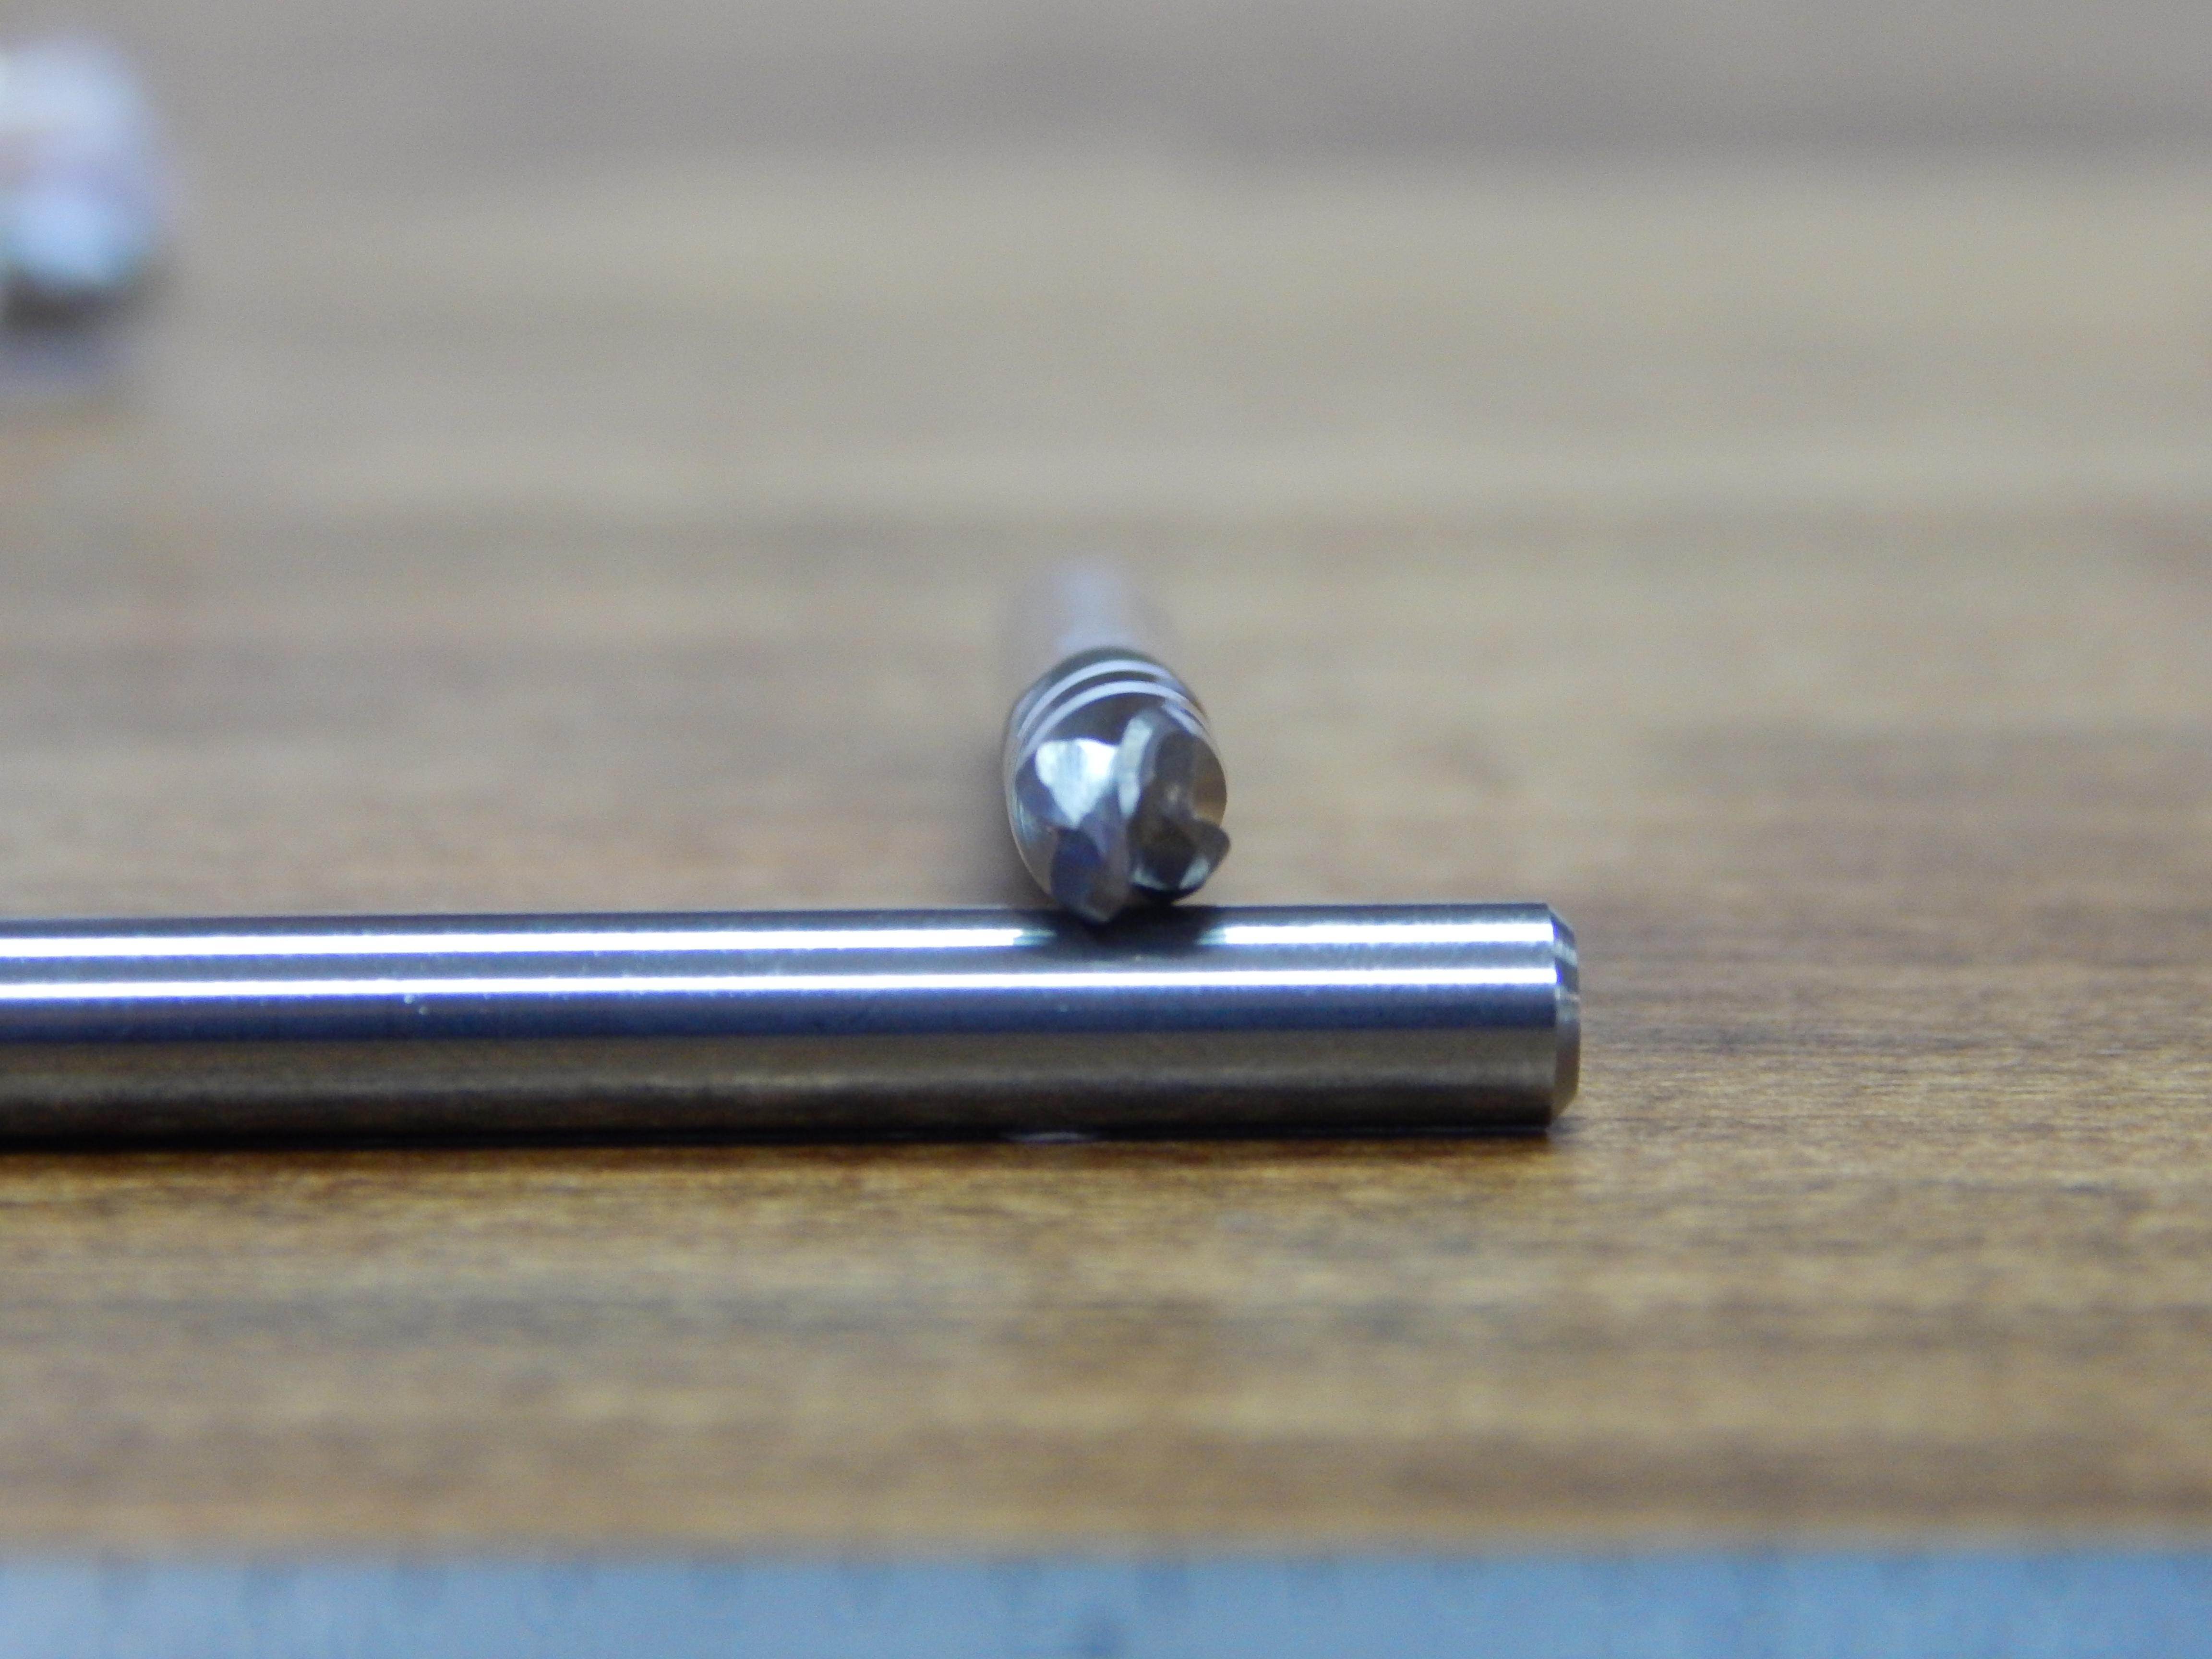 11//16 Regular Length YG-1 43350CC HSSCo8 End Mill Ball Nose TiCN Finish 3-3//4 Length 4 Flute